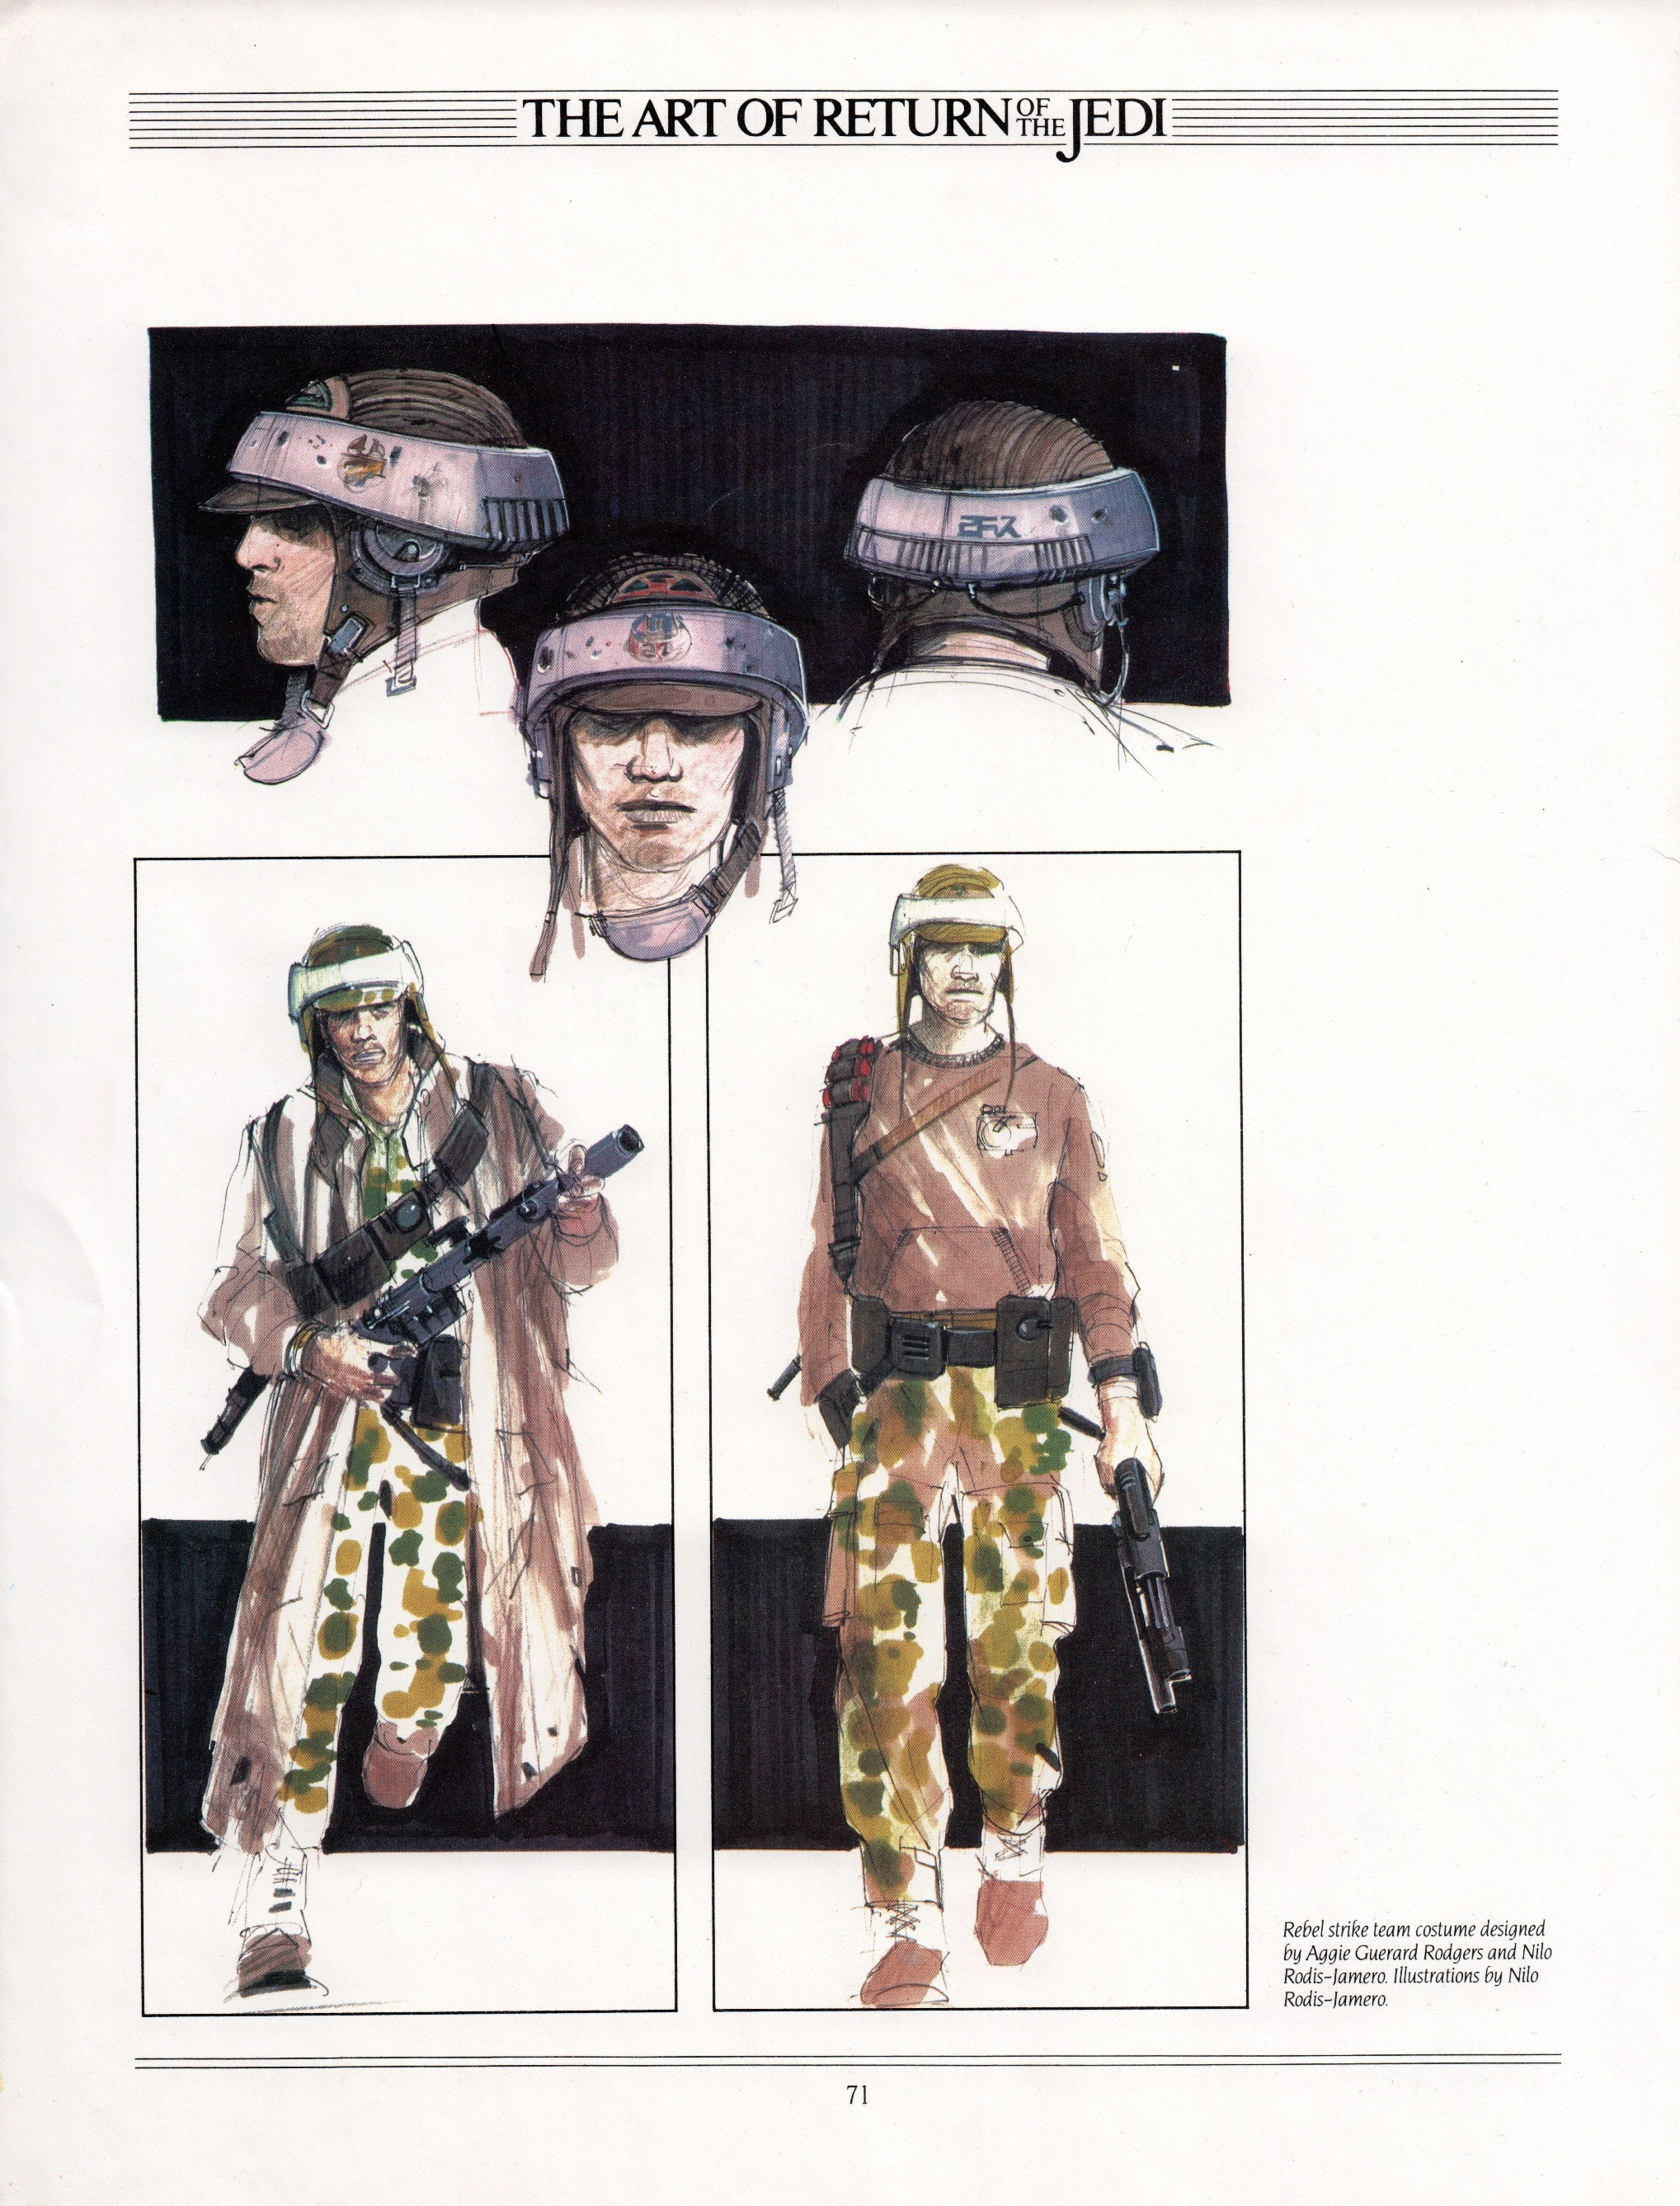 Art of Return of the Jedi (b0bafett_Empire)-p071